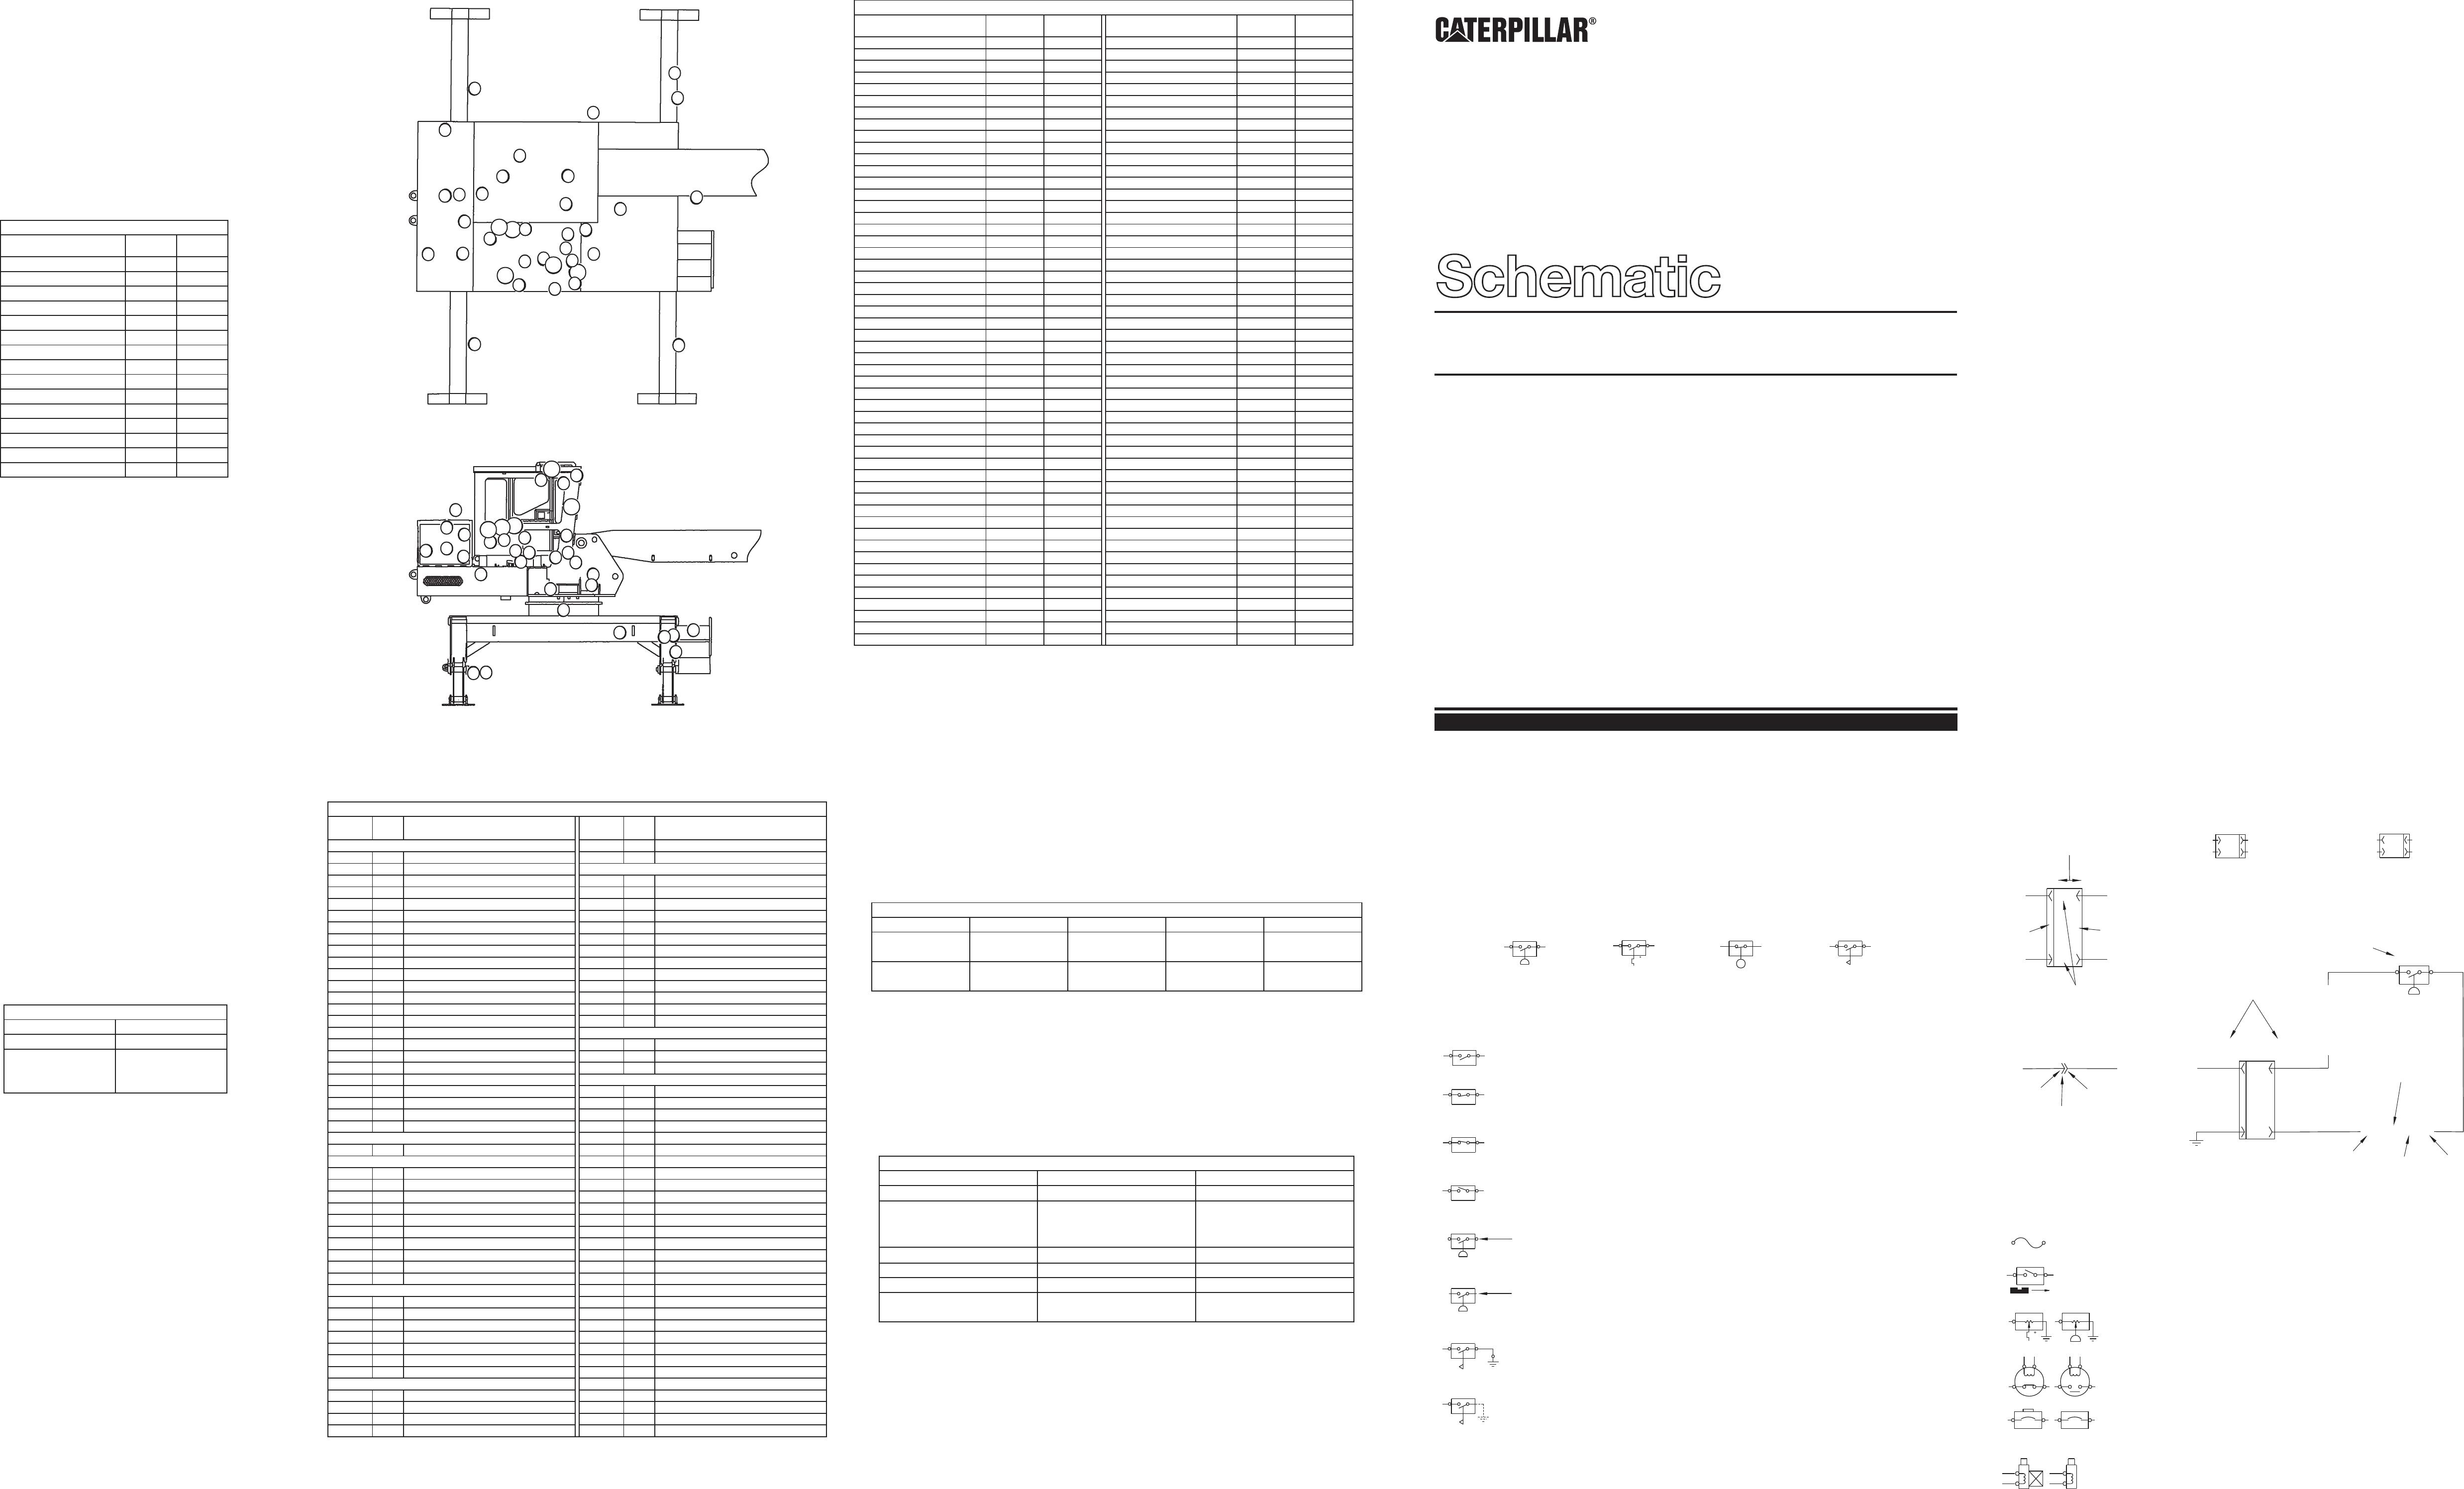 539 knuckleboom loader electrical schematic | cat machines electrical  schematic  cat machines electrical schematic